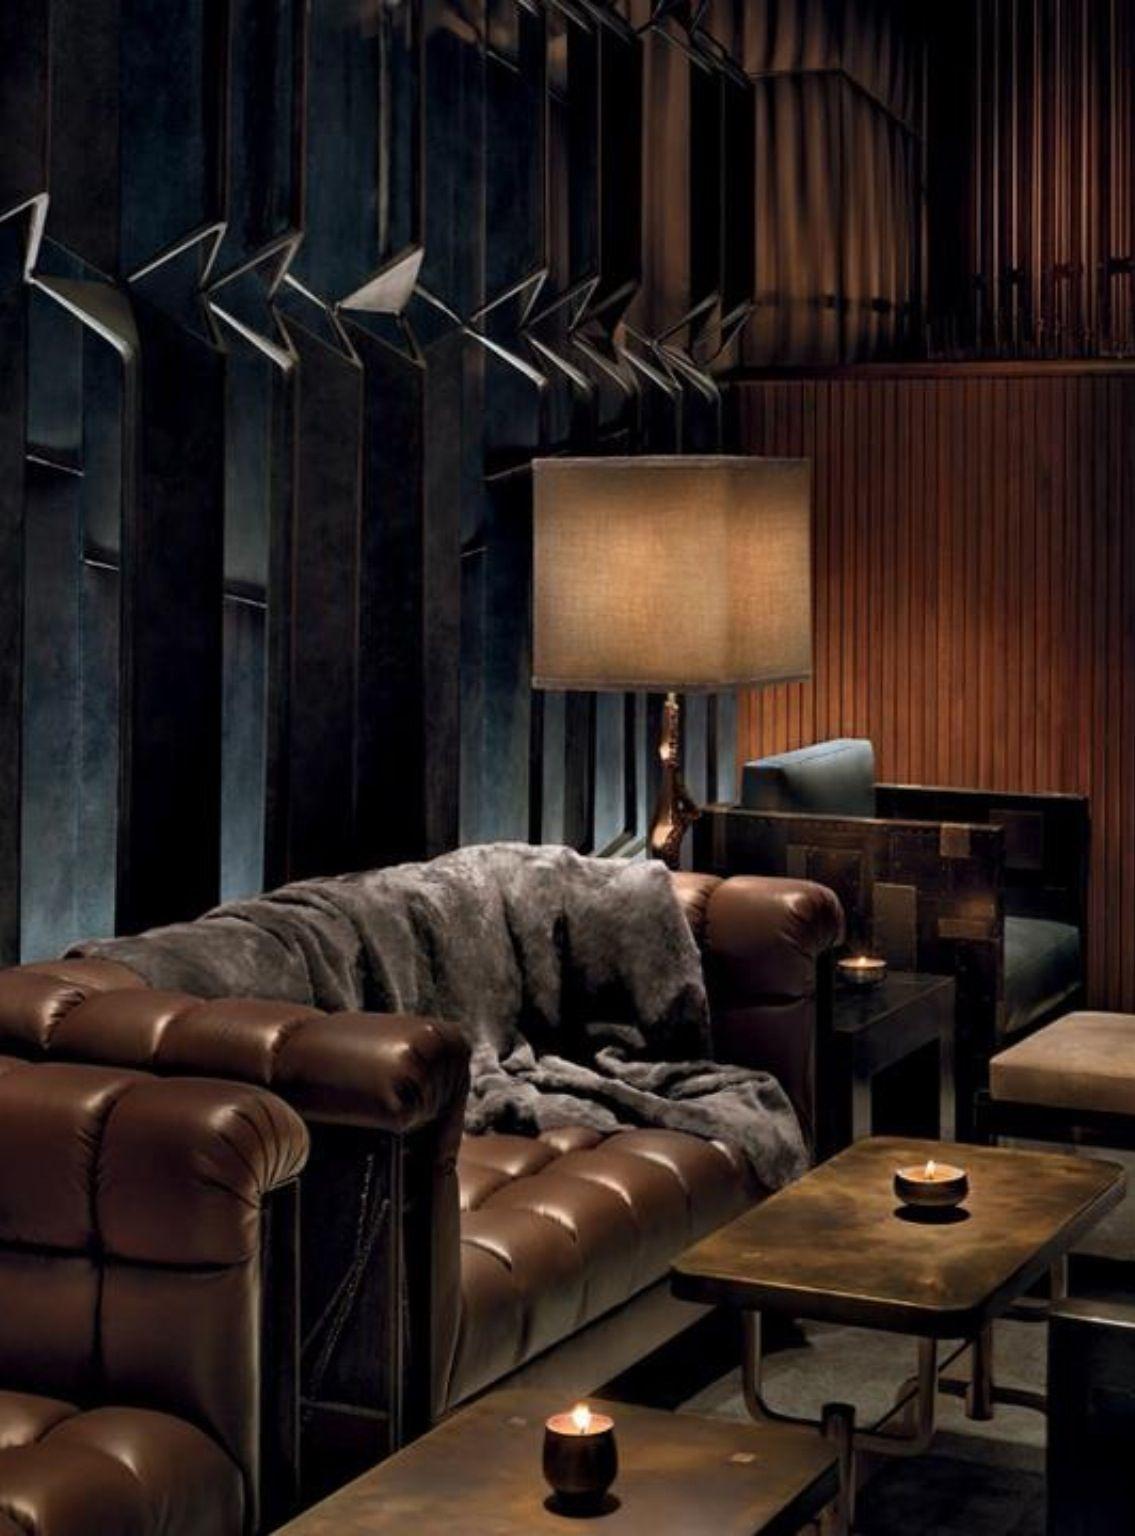 Hotel Room Furniture: Dark Moody Sitting Room # Inscapes Design